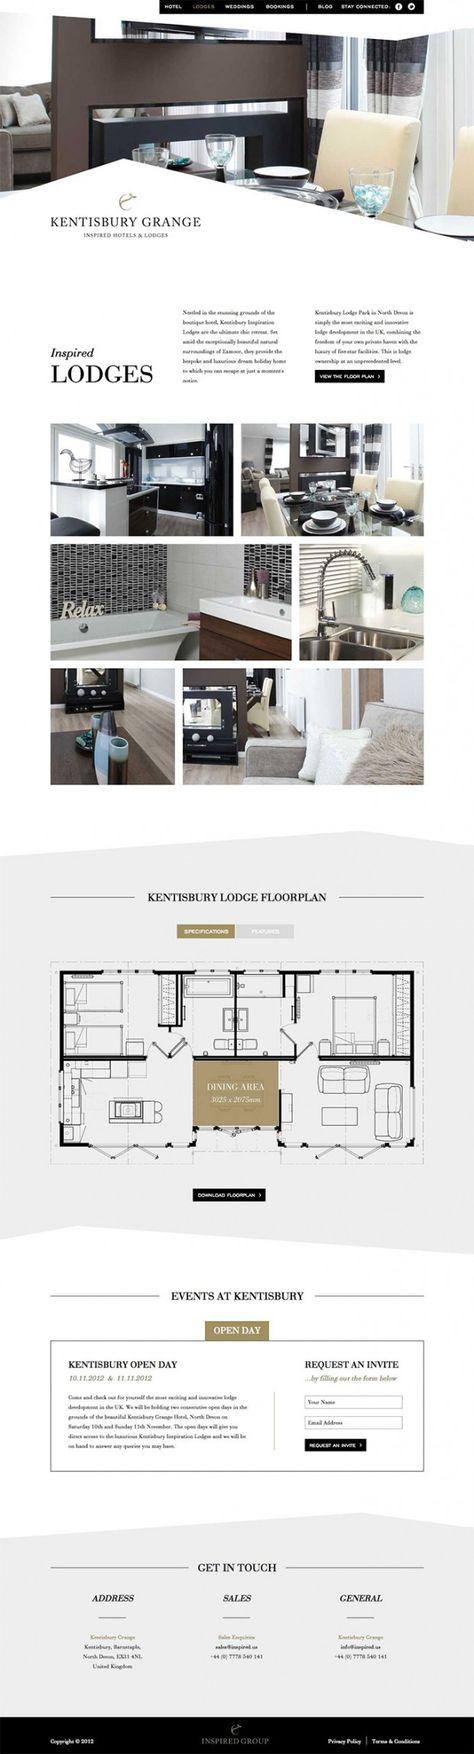 Kentisbury-Grange > like the simple creation of horizontal space with asymmetric lines